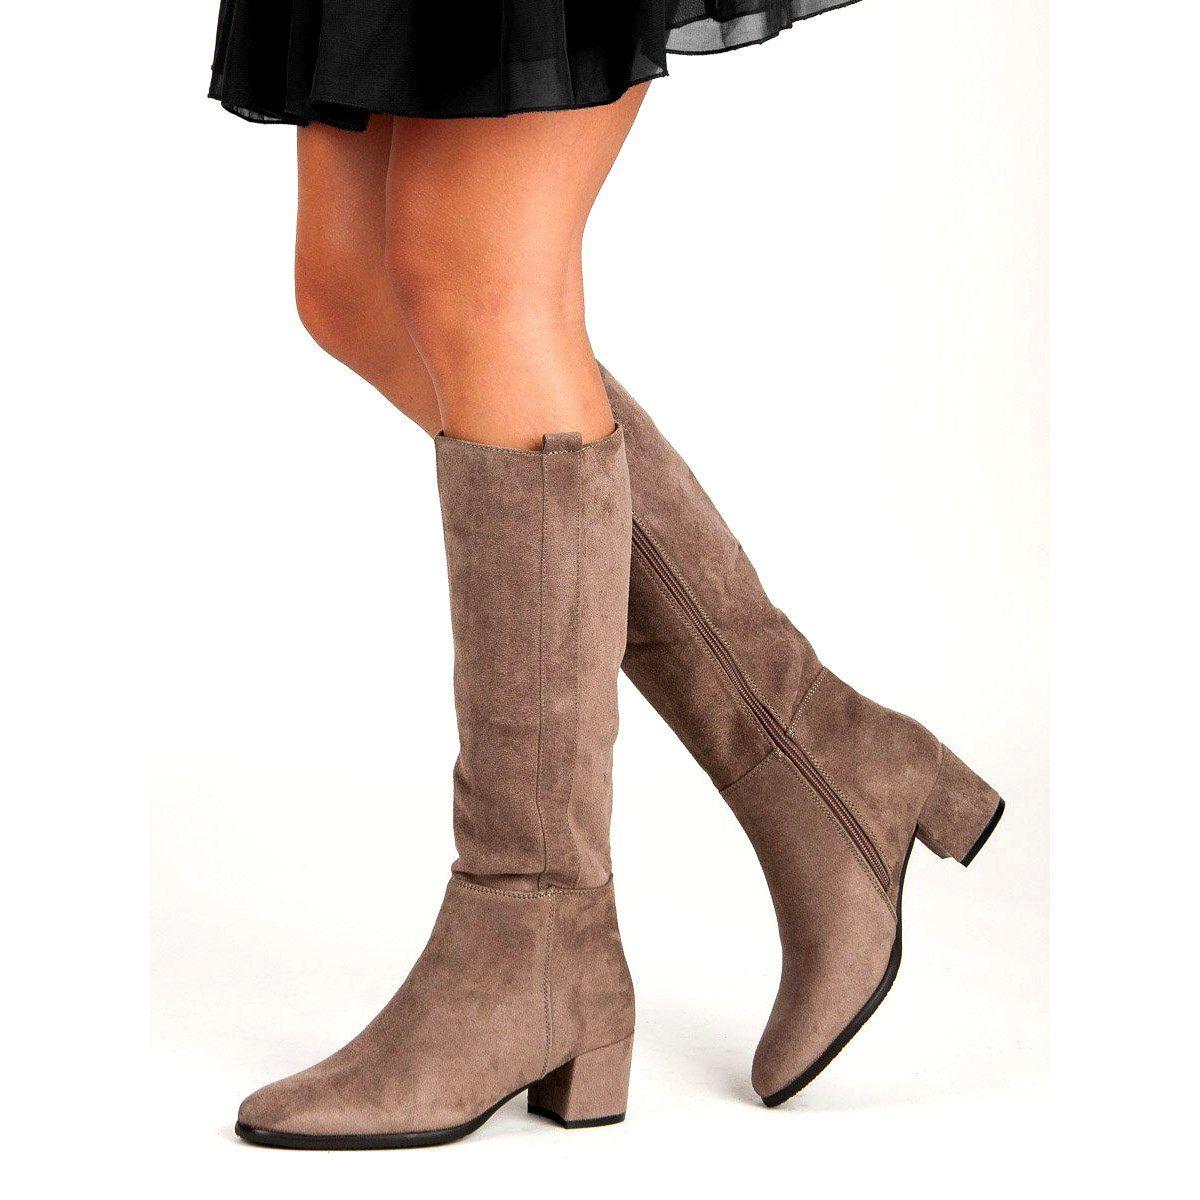 Filippo Bezowe Kozaki Na Obcasie Bezowy Boots Ankle Boot Shoes